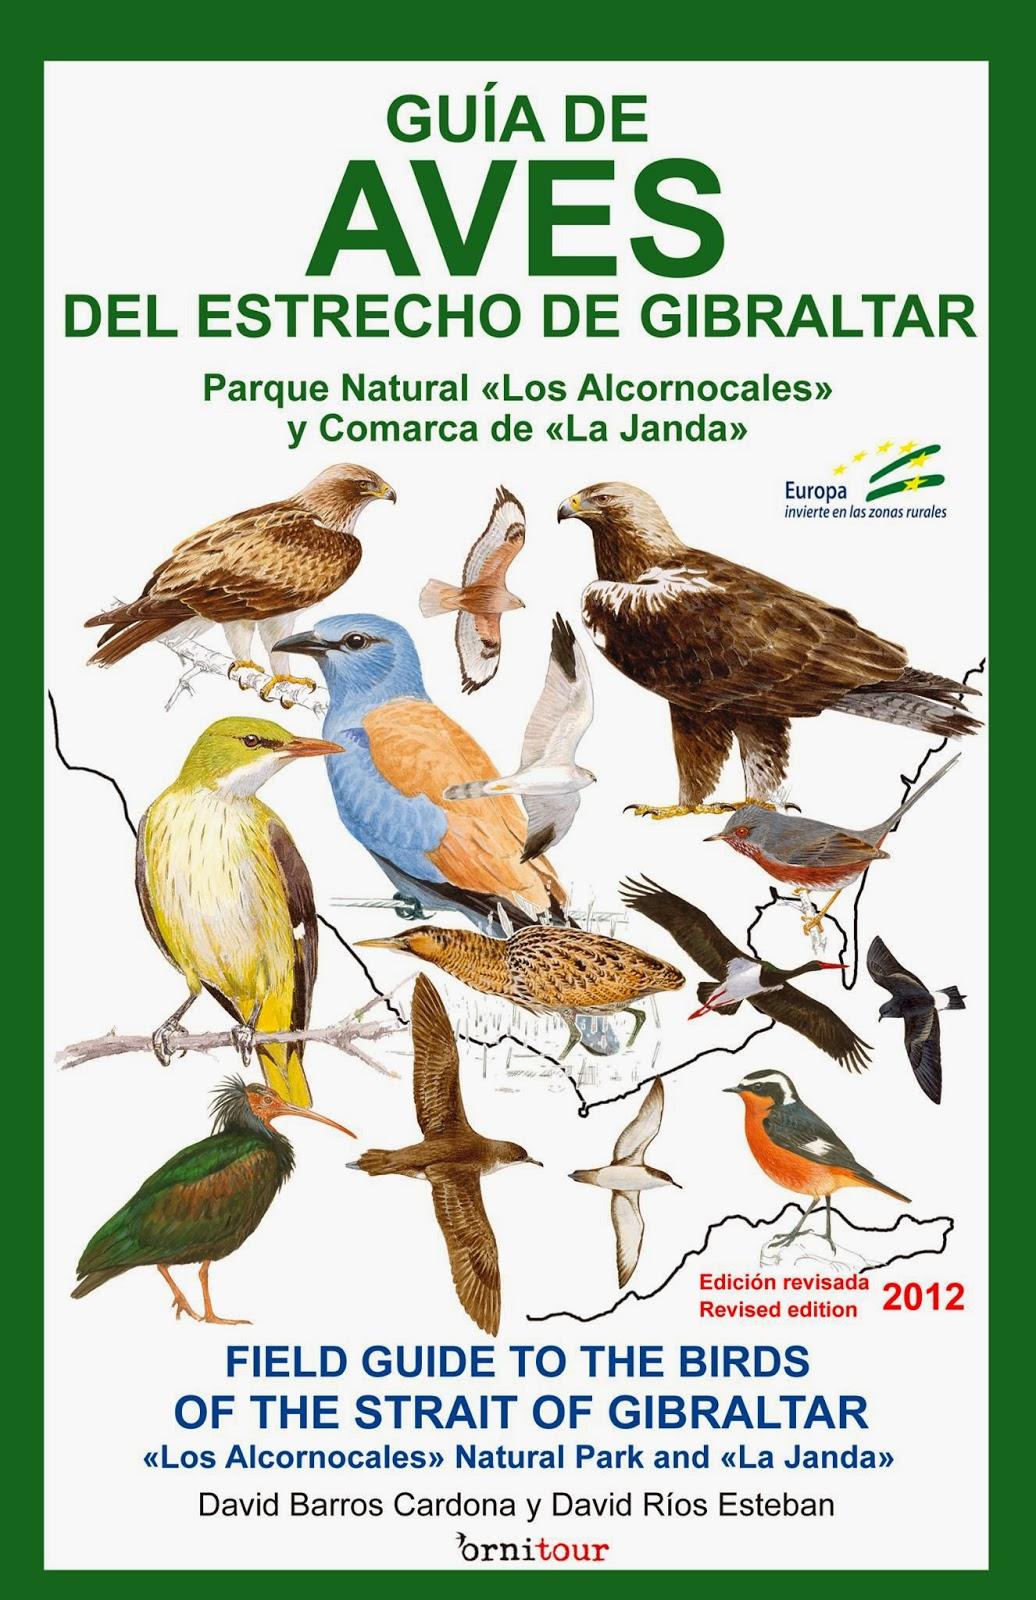 Guia de Aves de la Comarca de la Janda